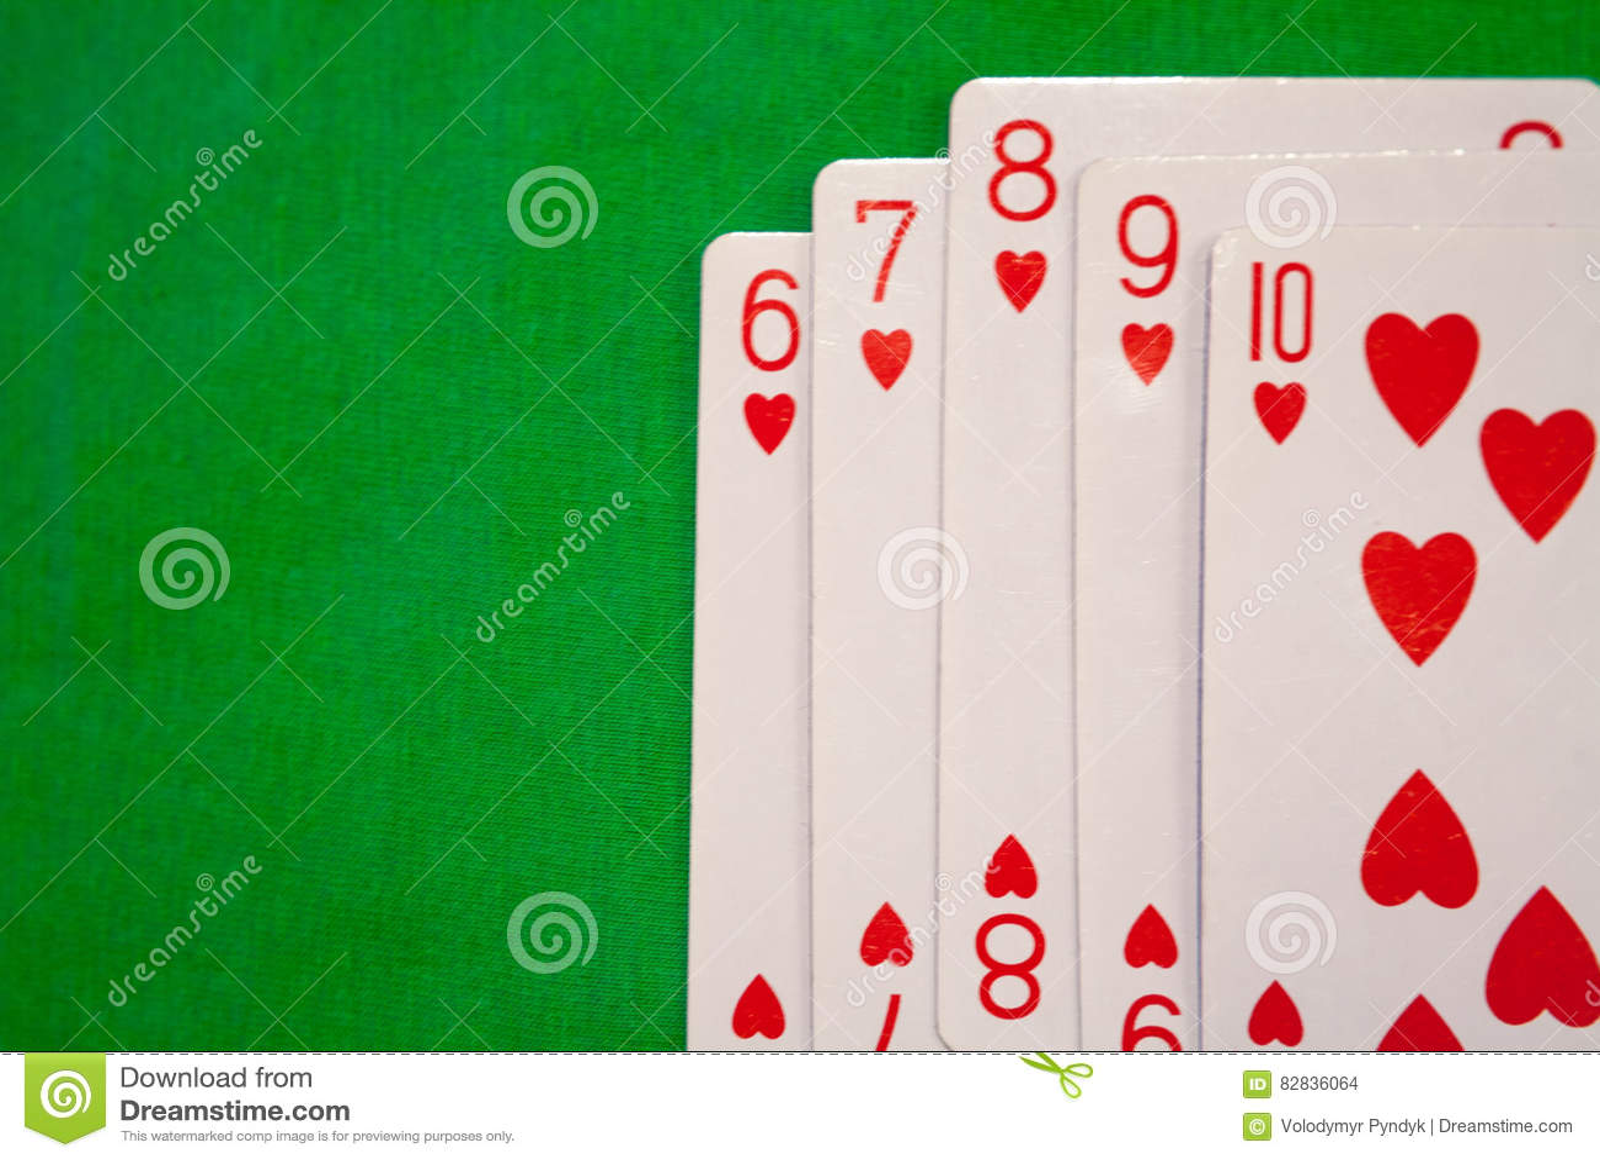 Straight Flush Poker Cards Combination On Green Background Casino